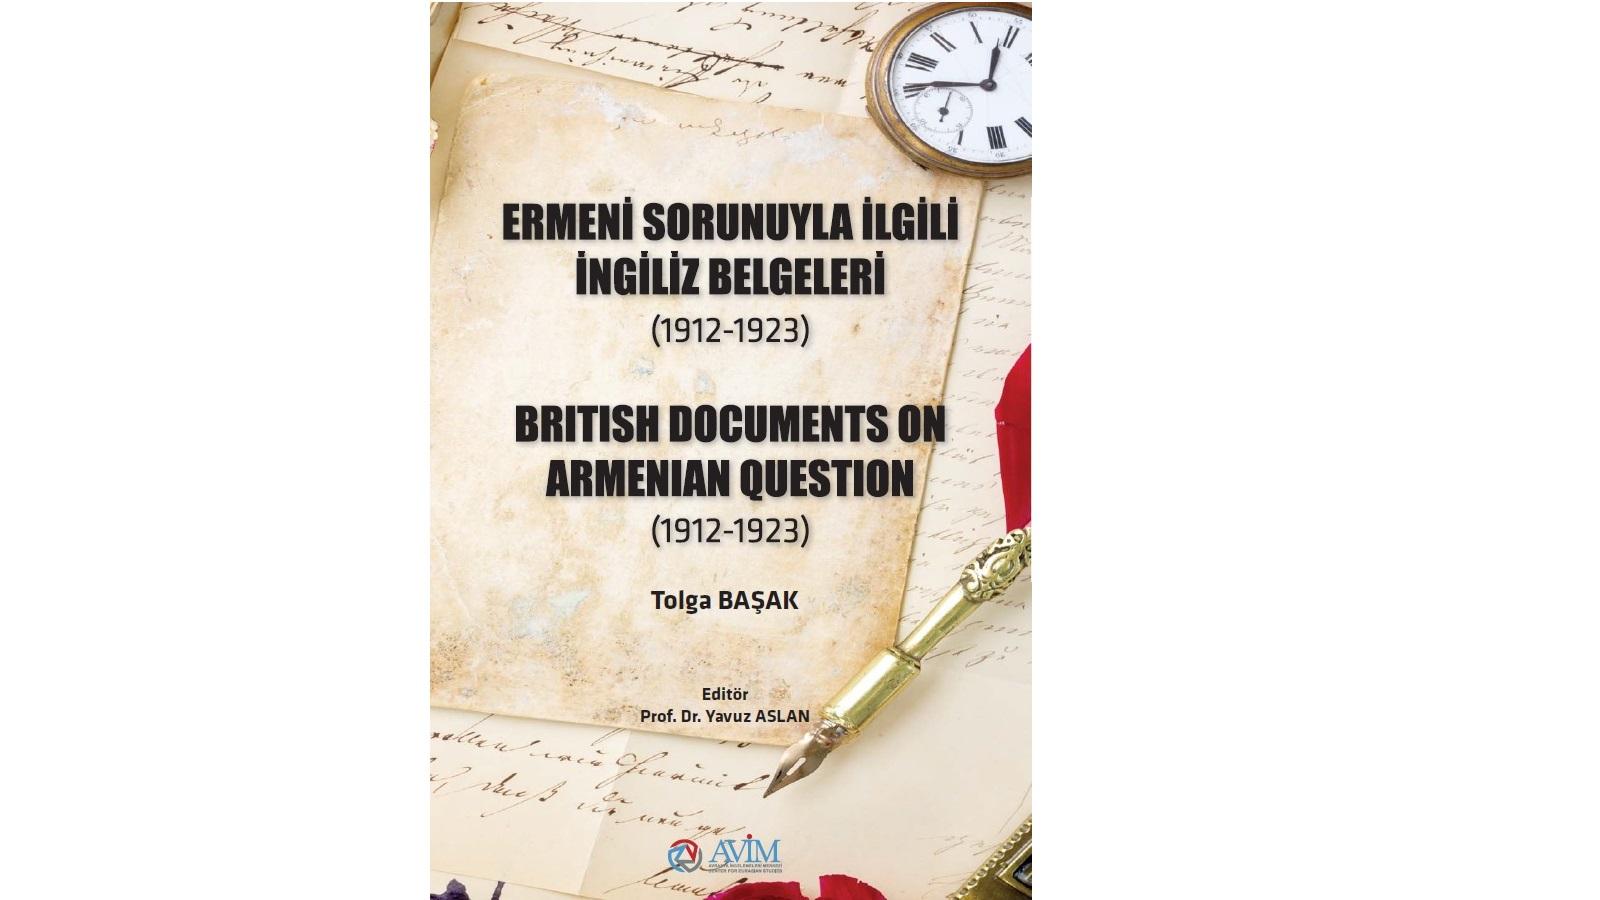 AVIM PUBLISHED THE BOOK ENTITLED BRITISH DOCUMENTS ON ARMENIAN QUESTION (1912-1923) BY ASSOCIATE PROFESSOR TOLGA BAŞAK